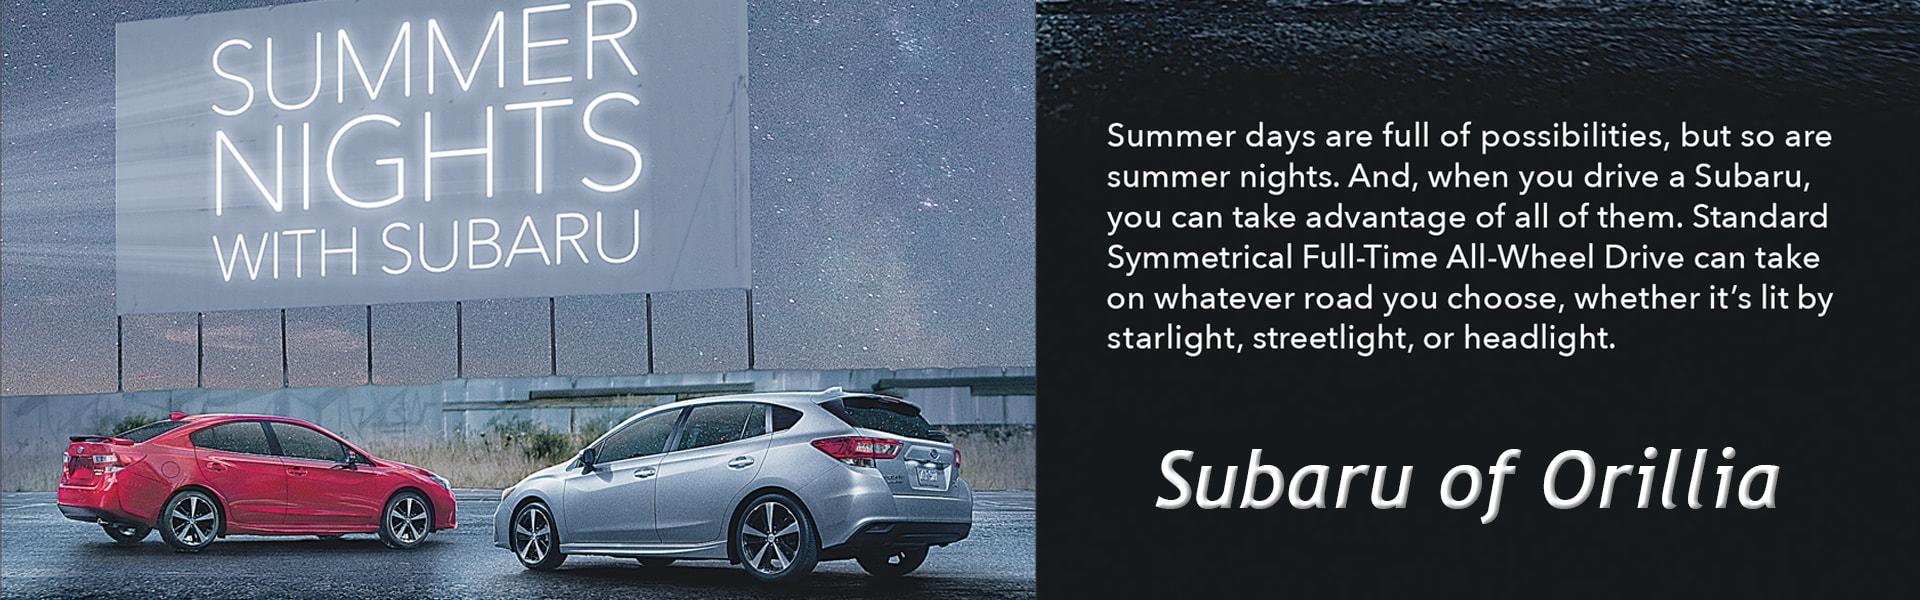 Subaru Summer